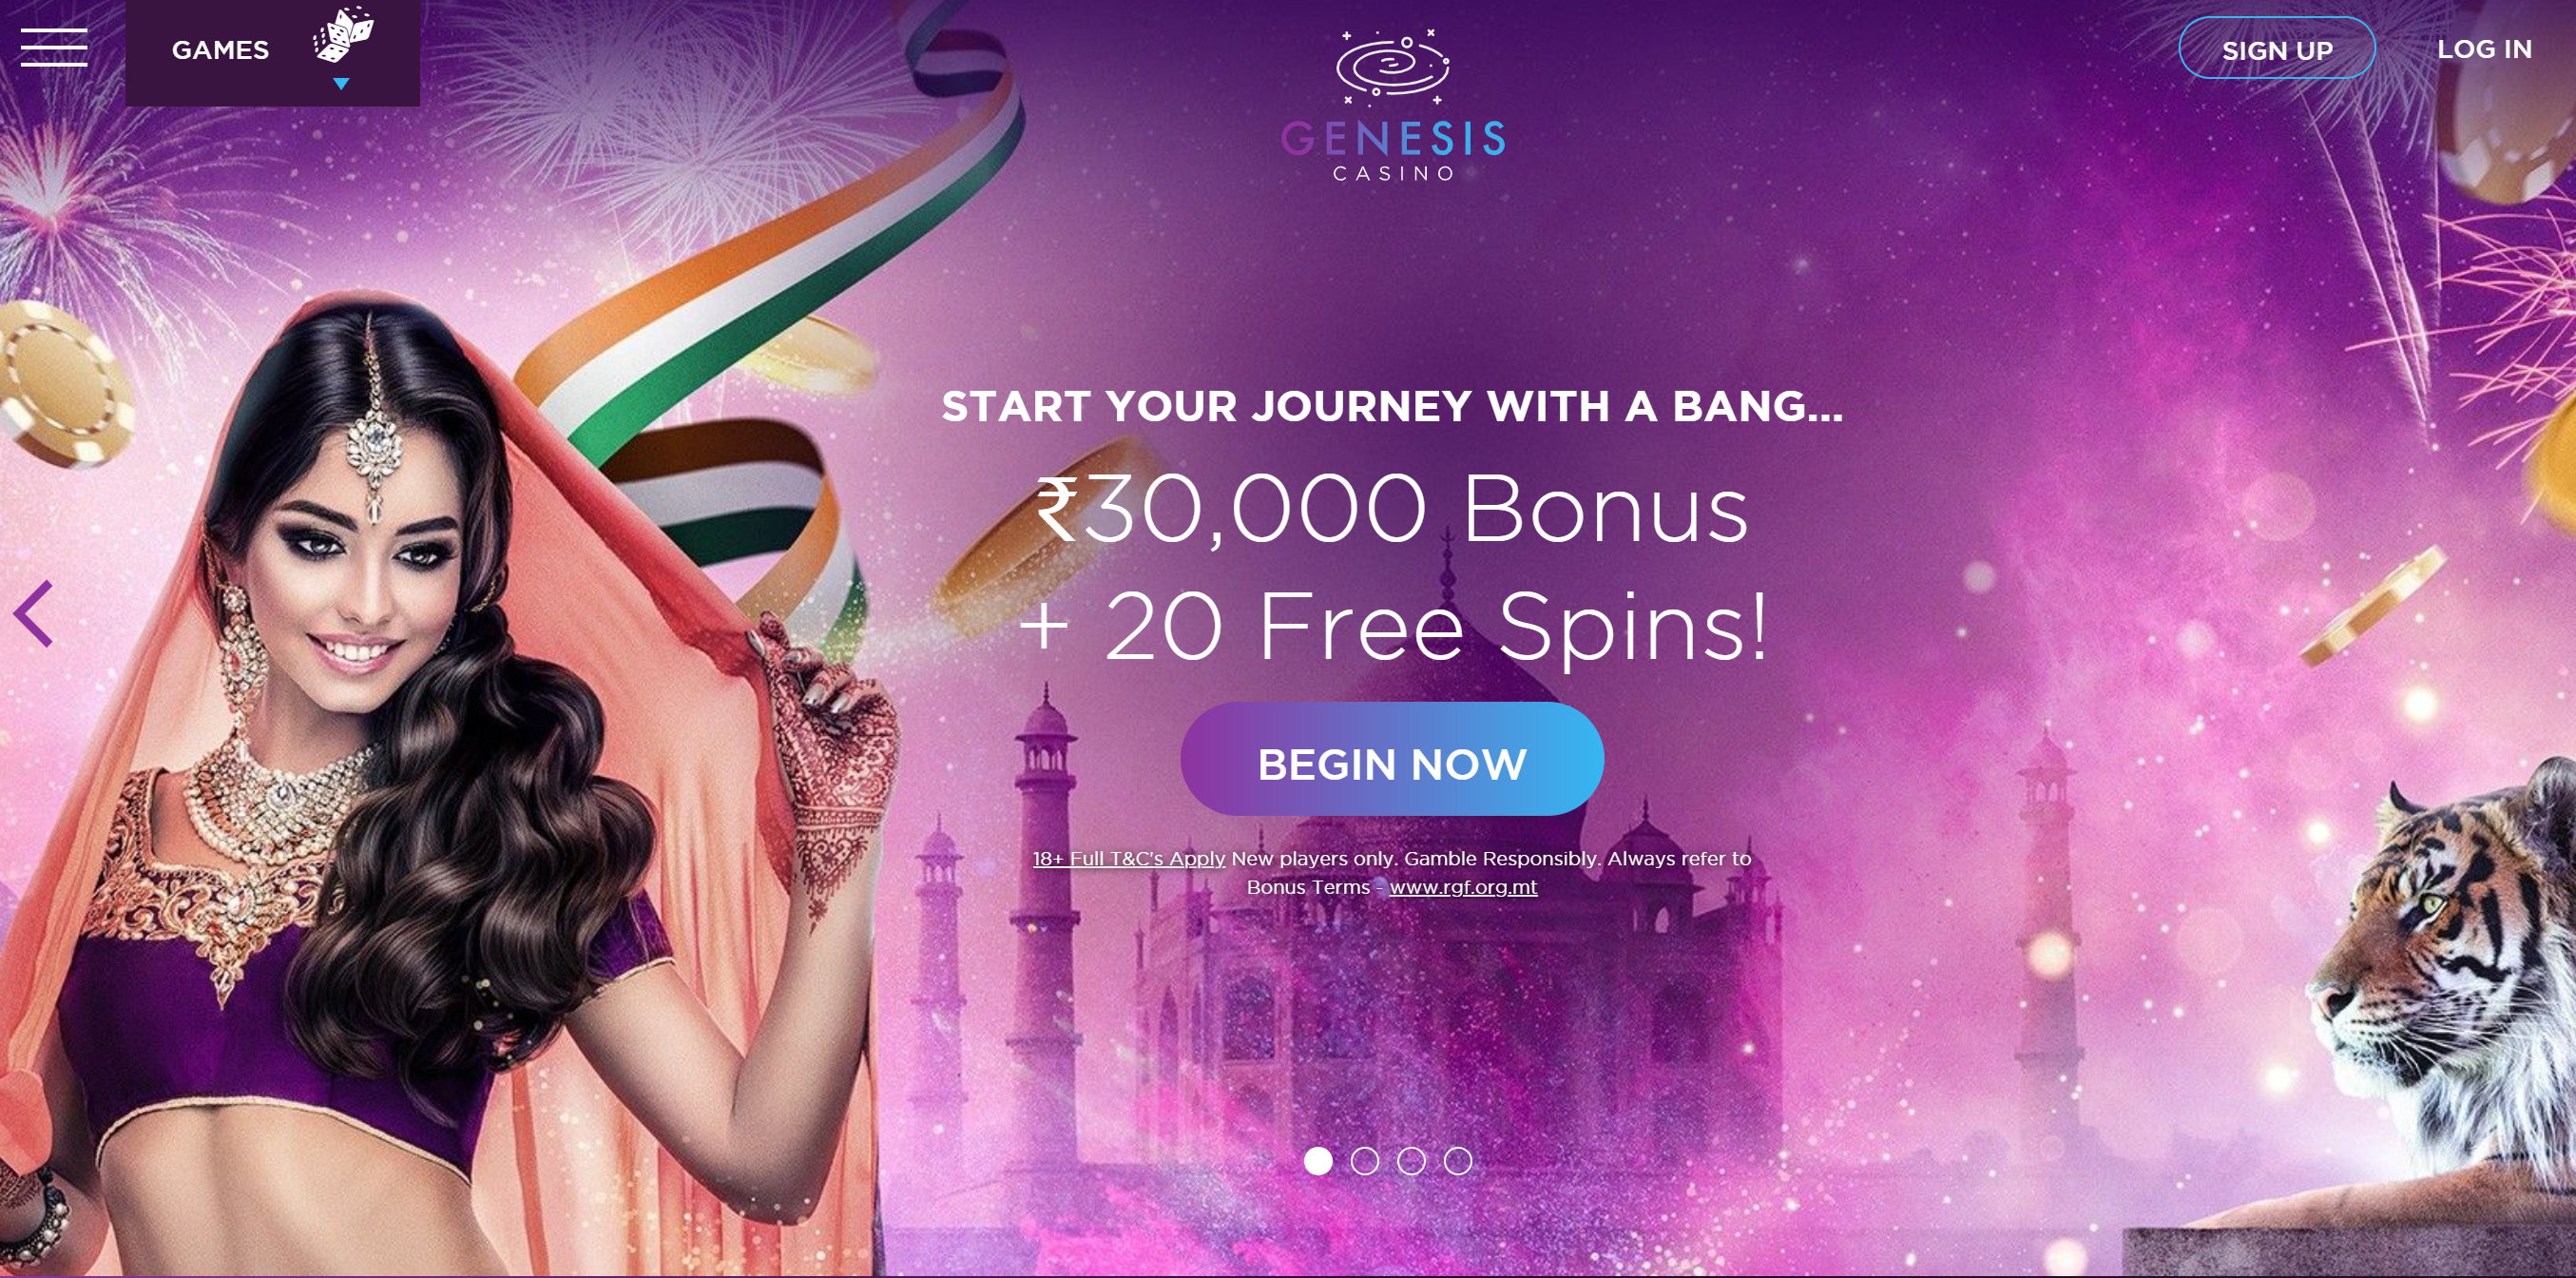 genesis casino welcome offer